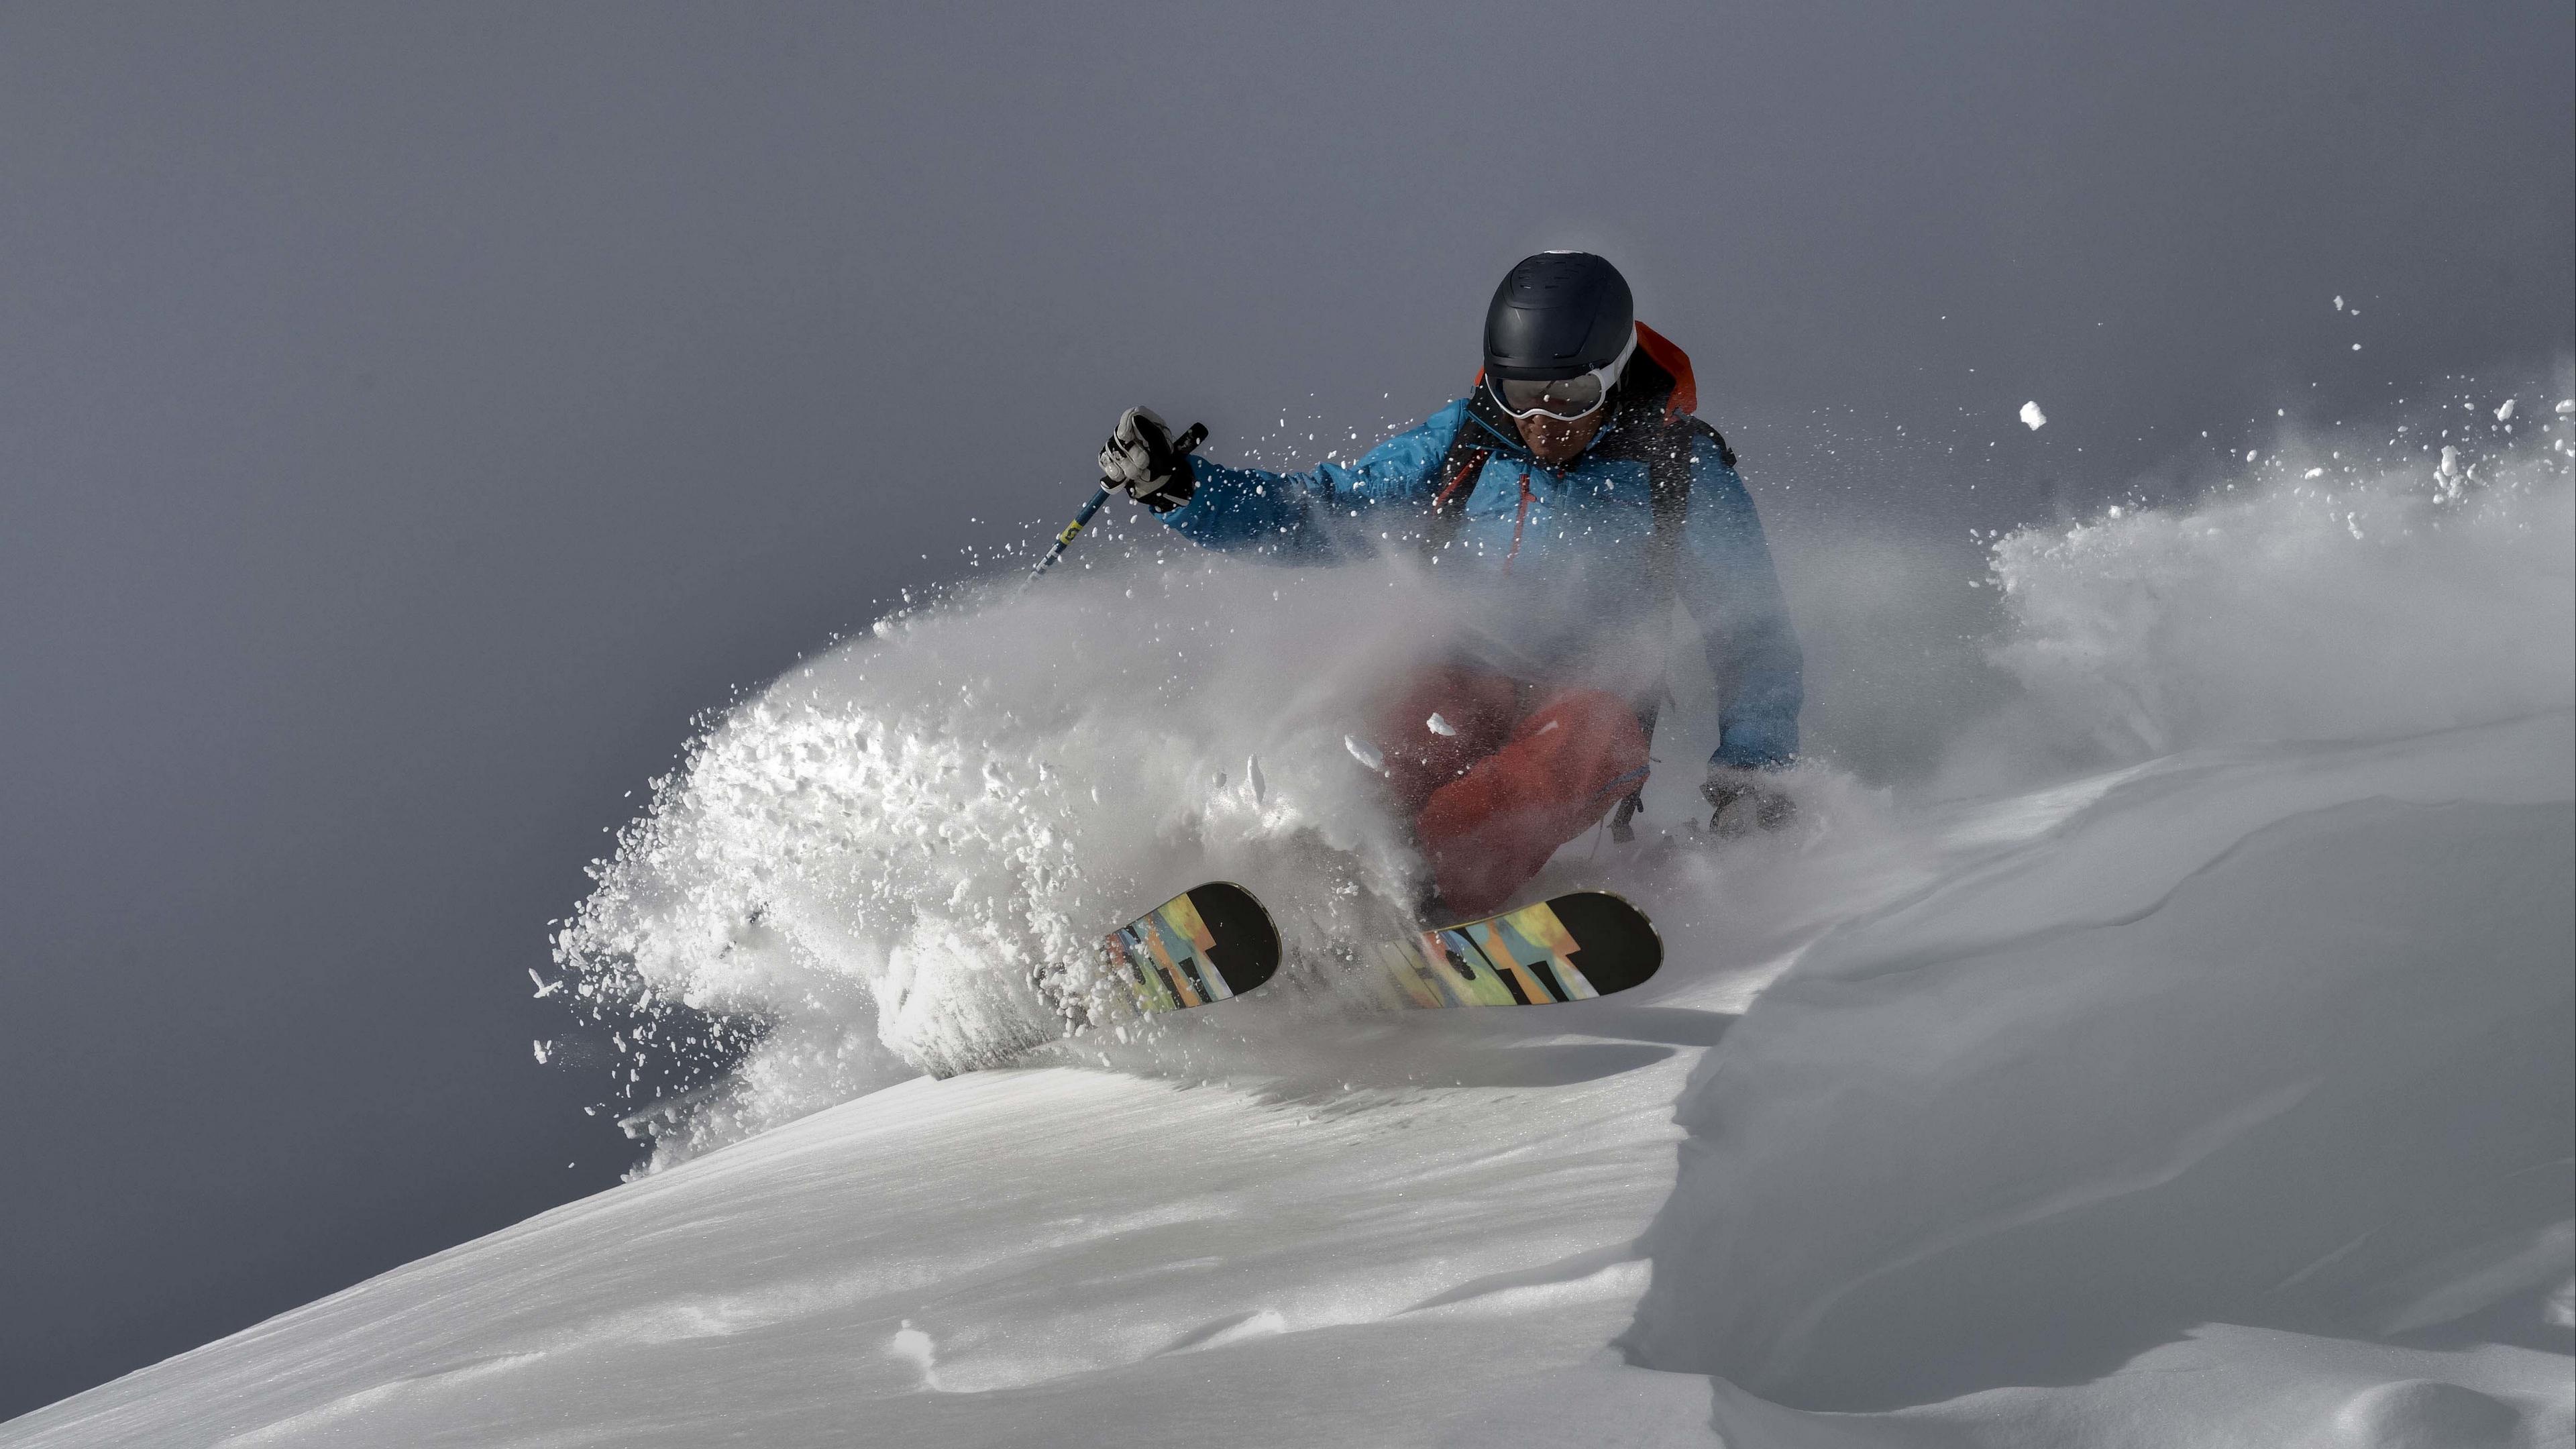 skier snow downhill 4k 1540063191 - skier, snow, downhill 4k - Snow, skier, downhill